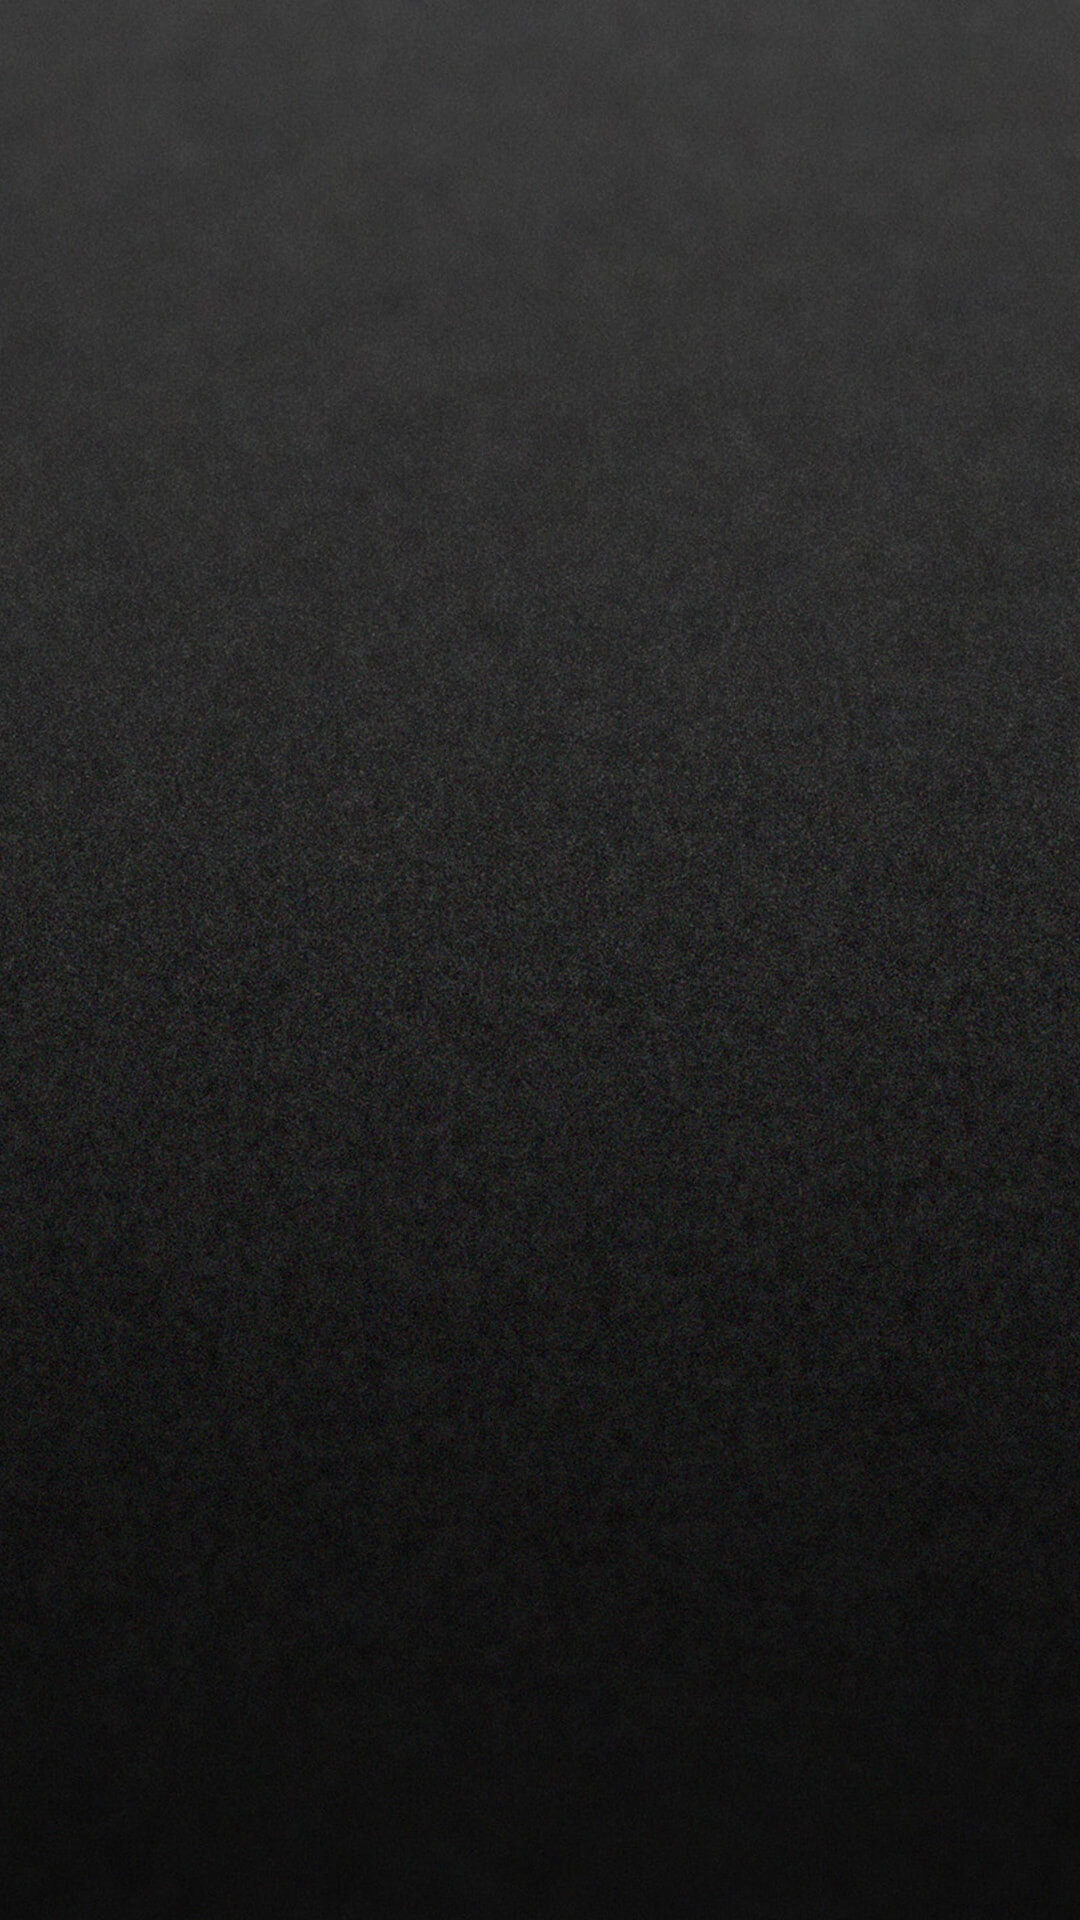 Black Wallpaper Tablet Posted By John Walker